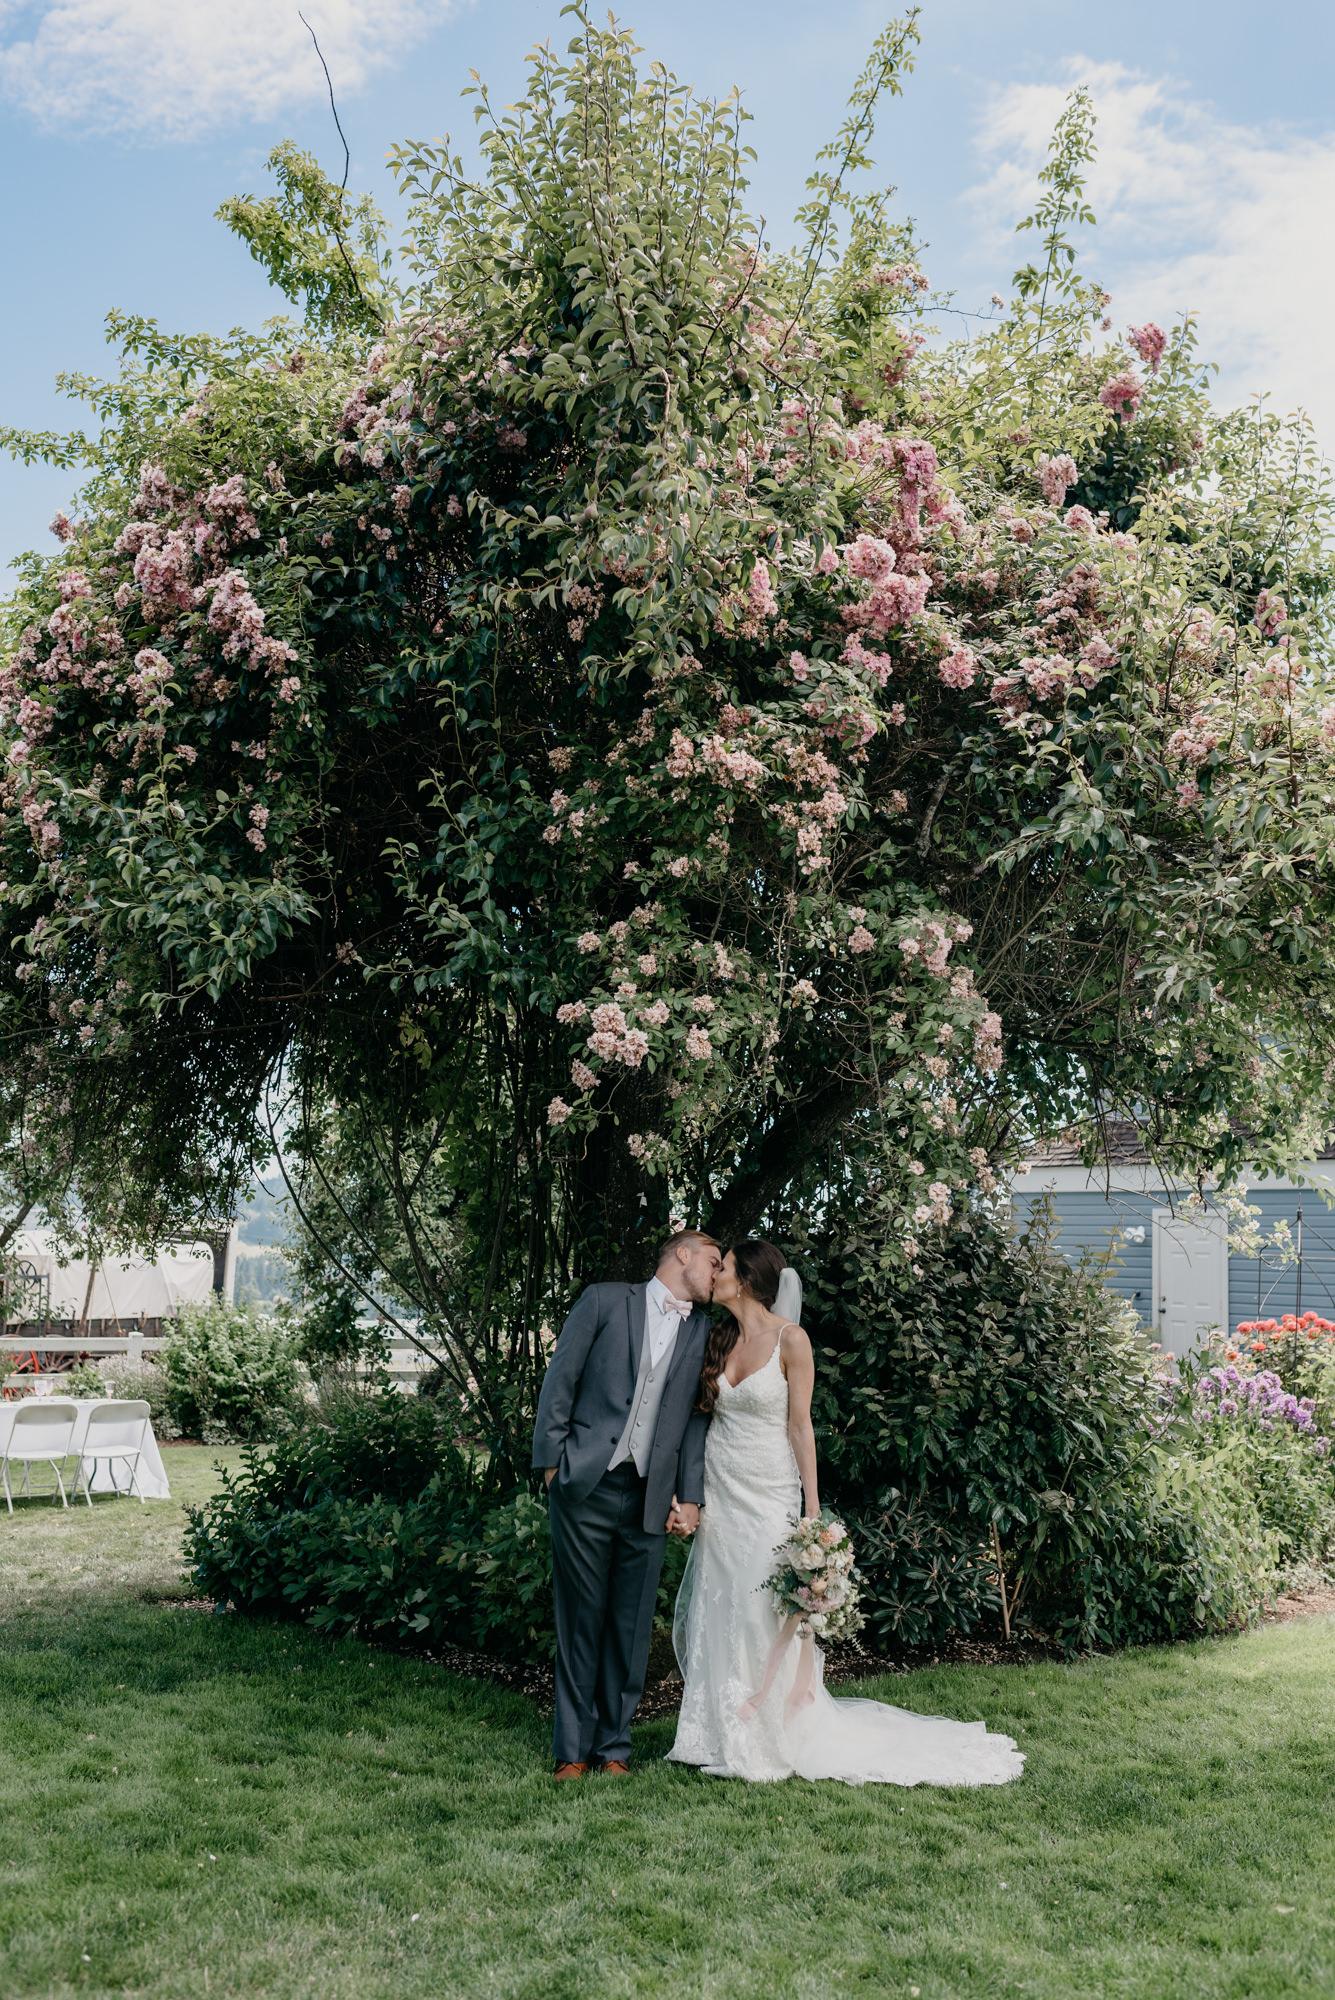 85-lake-oswego-wedding-portland-couple-rose-tree.jpg